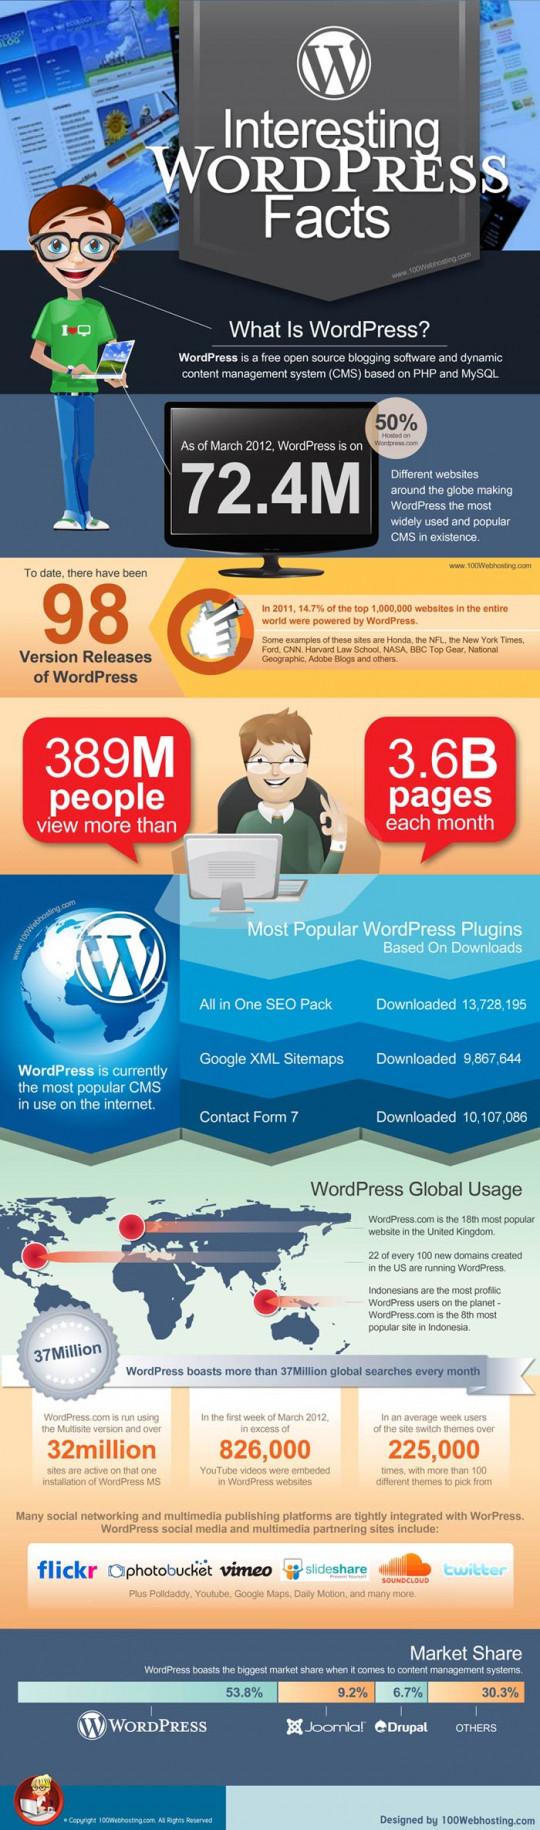 Interesting WordPress Facts